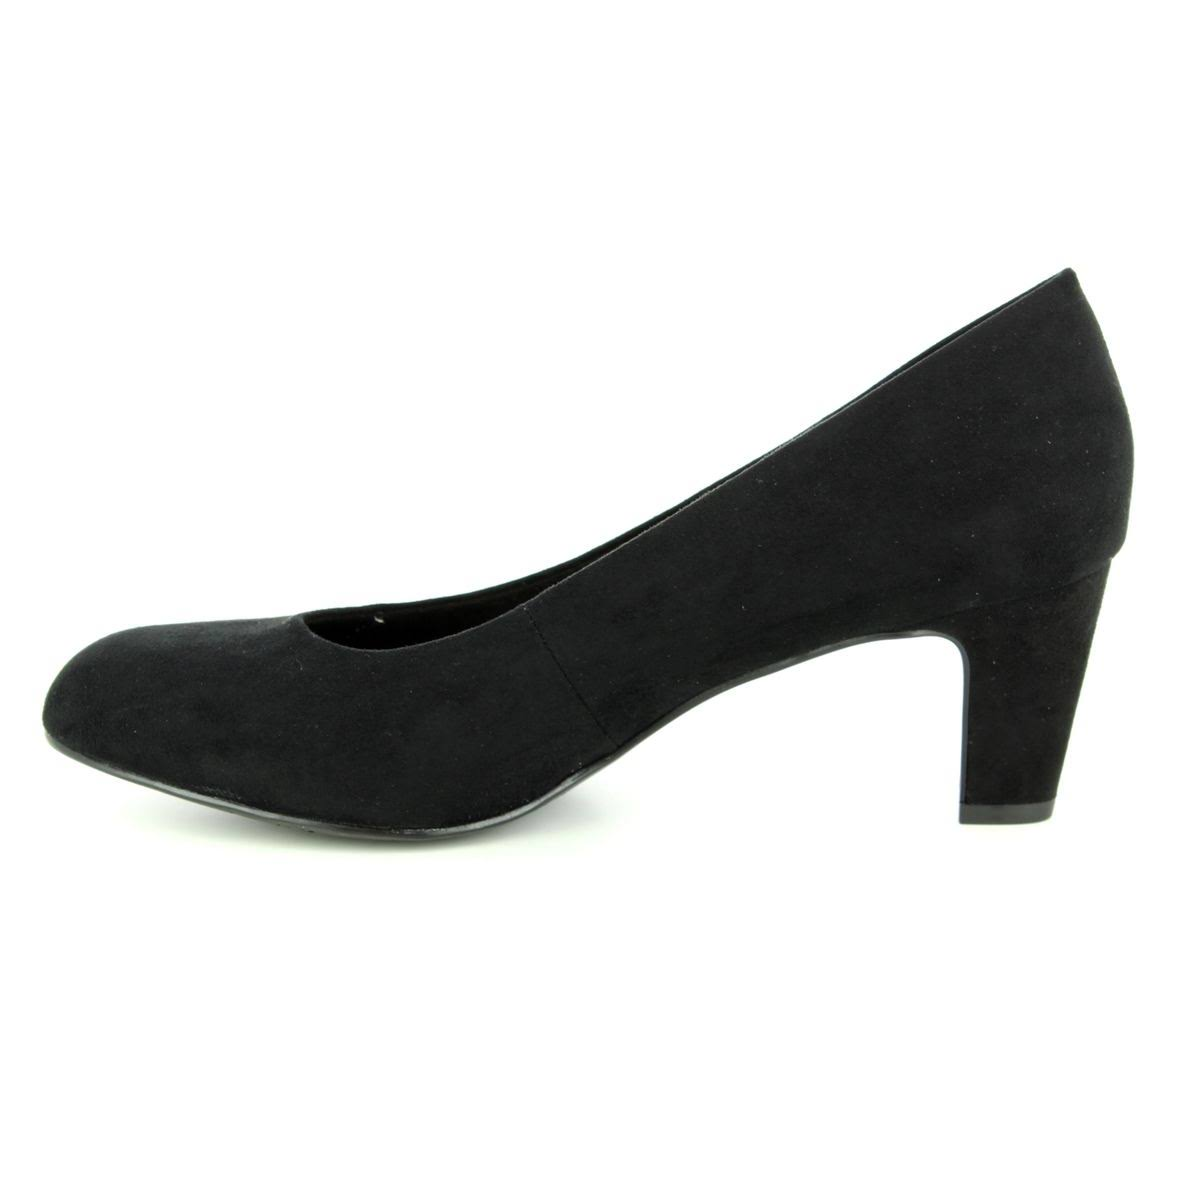 21 22418 85 Caxias Black Shoes Womens Heeled 001 Tamaris 5znWaIww